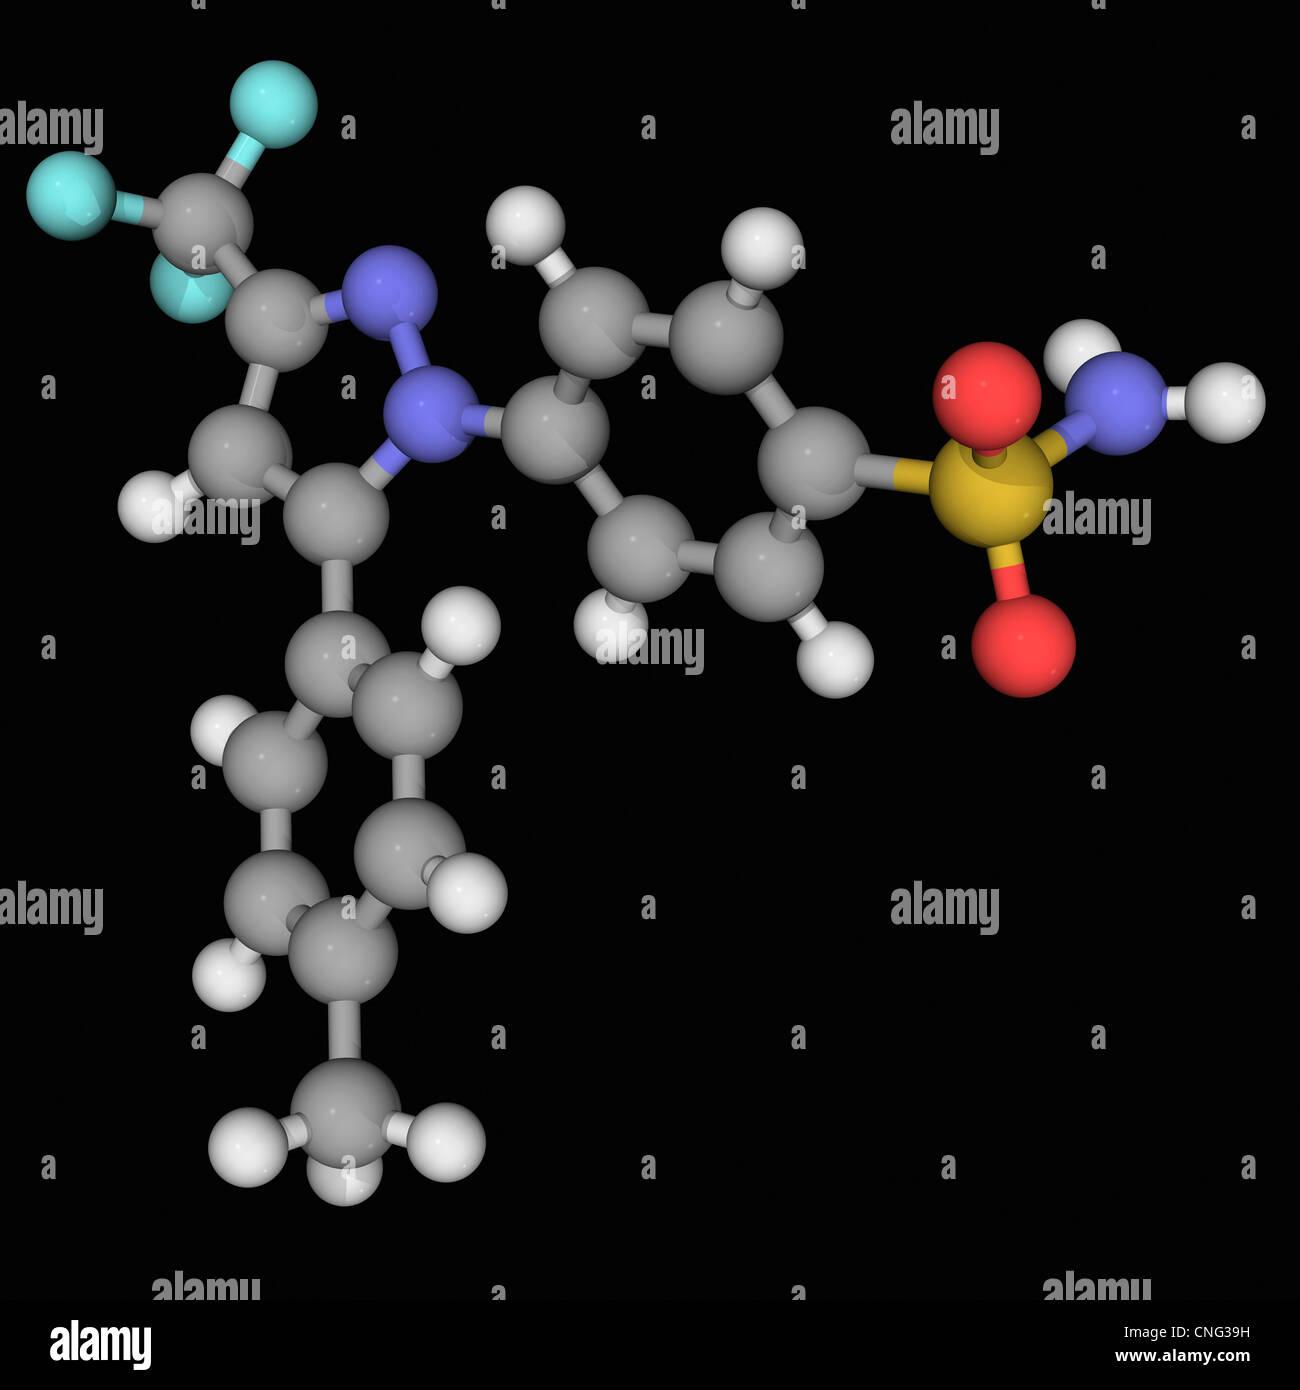 Celecoxib drug molecule - Stock Image